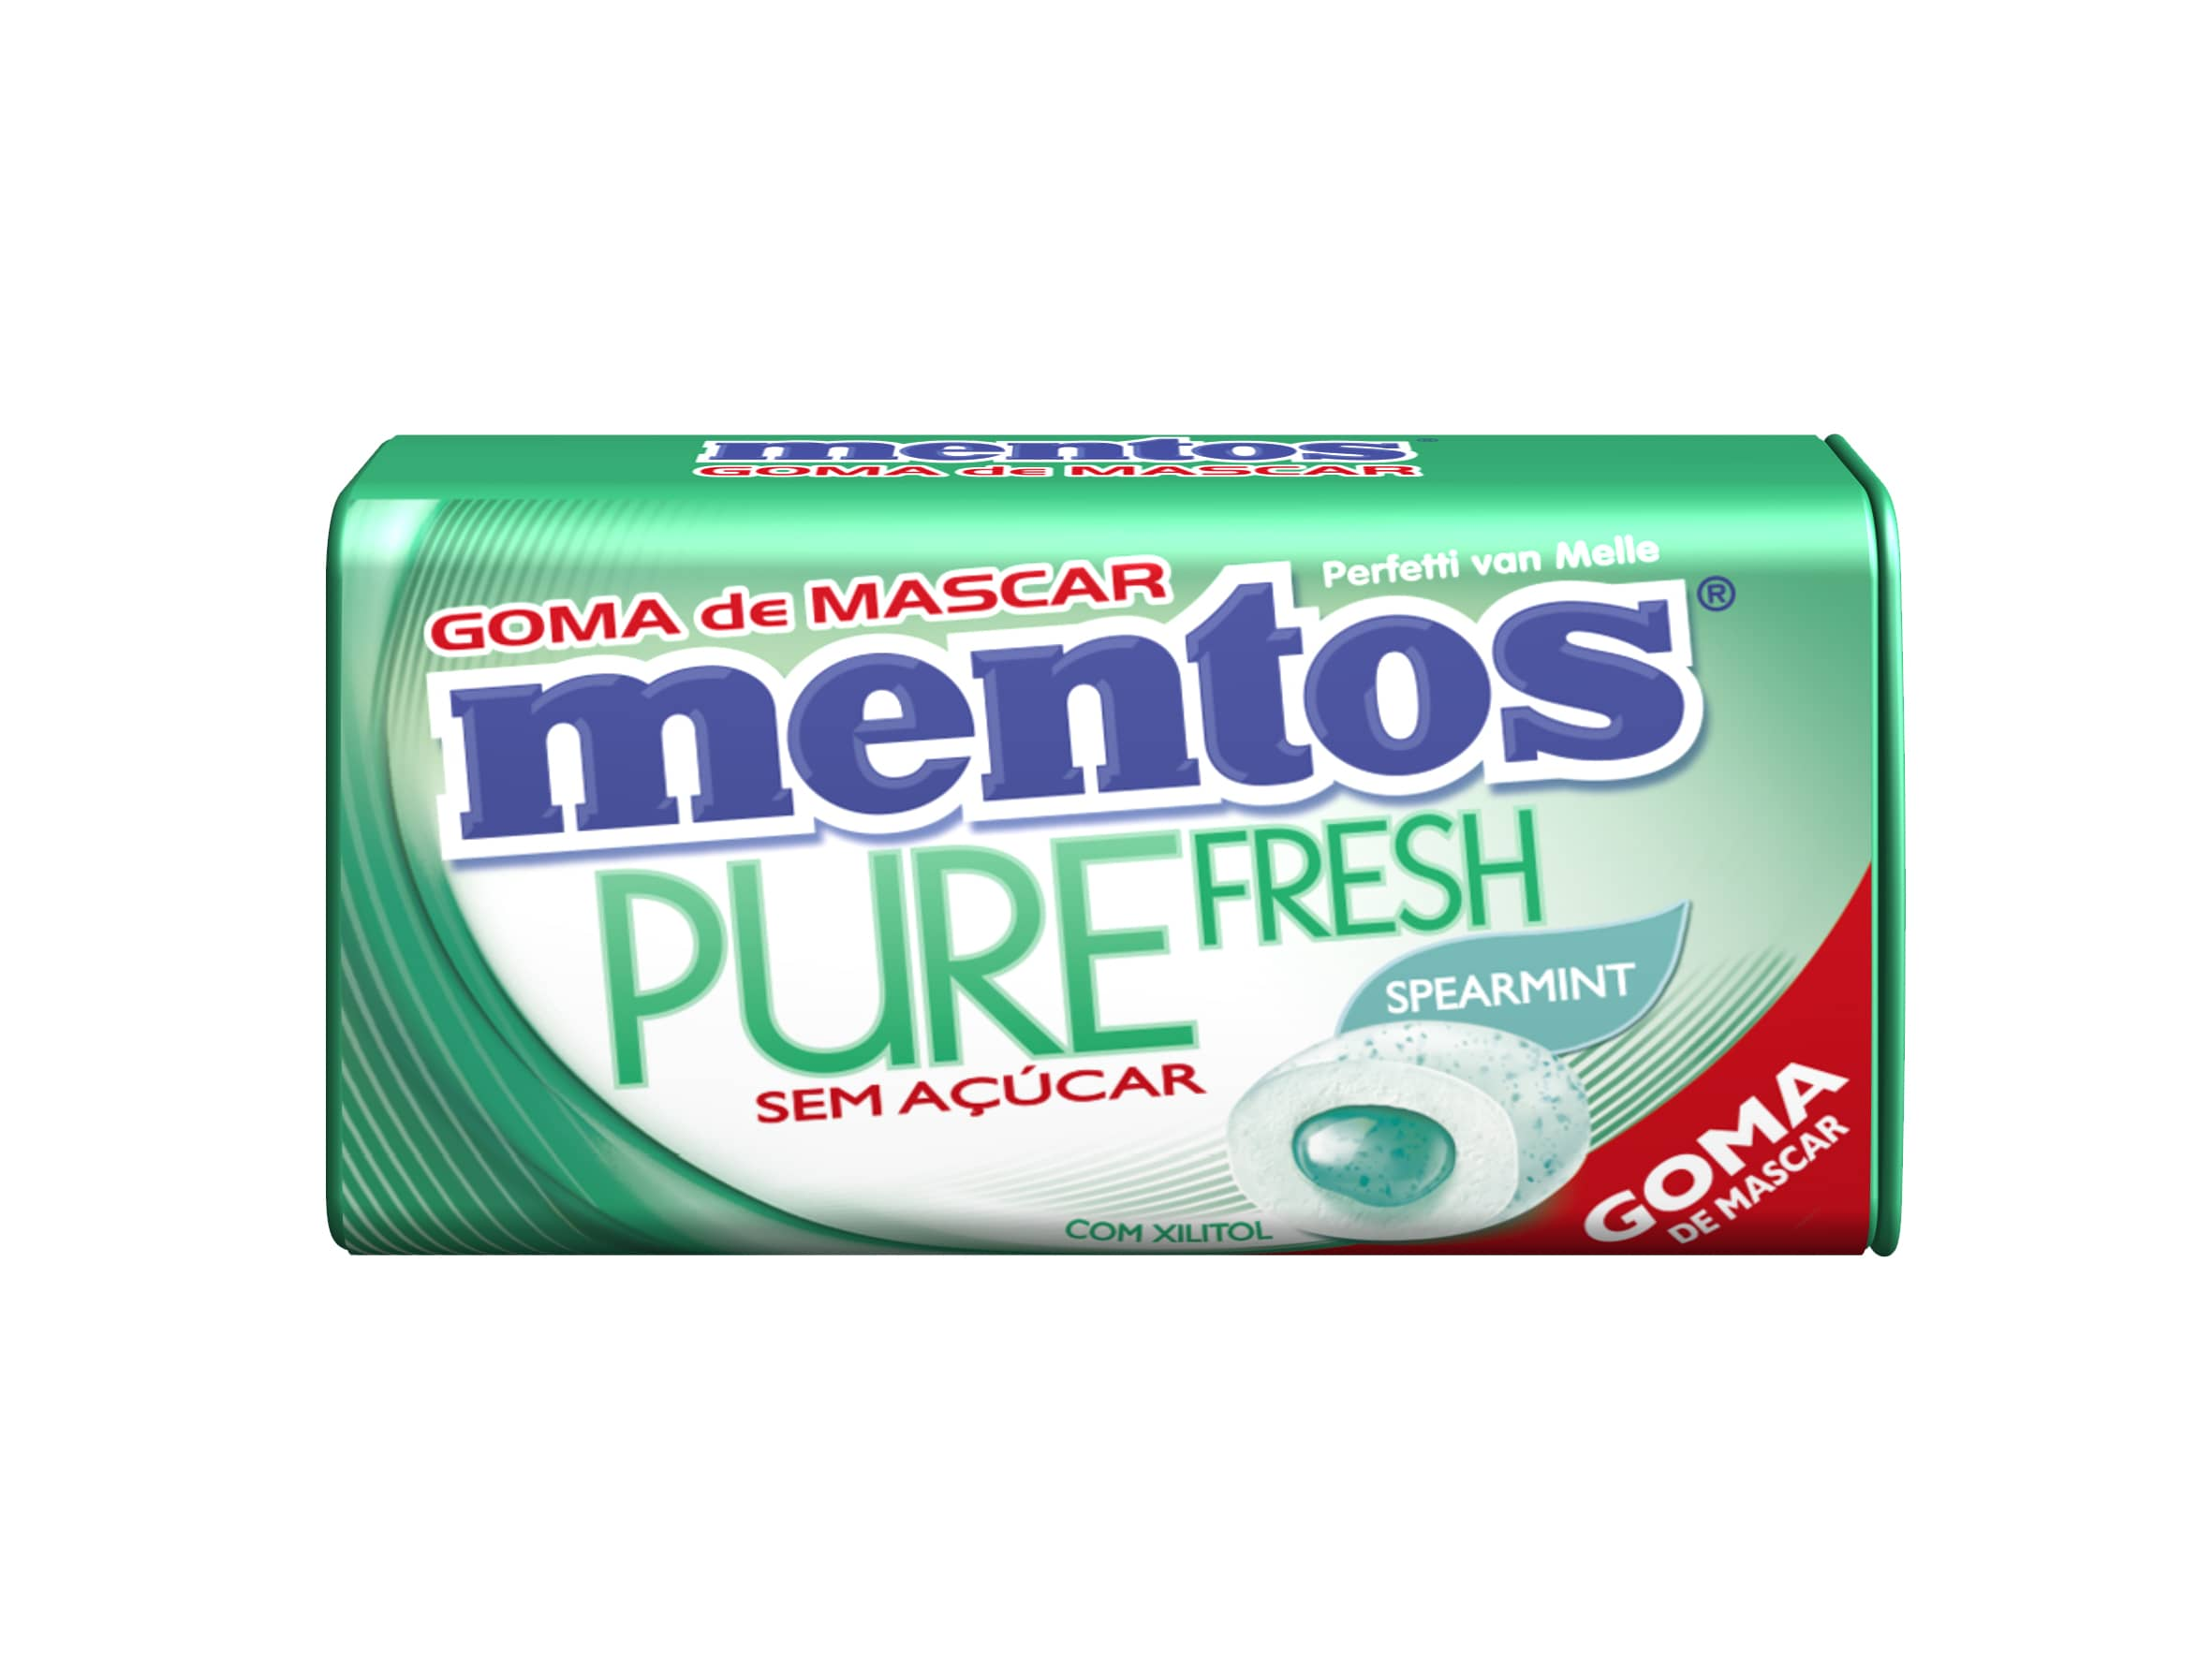 Mentos-Pure-Fresh-Spearmint_lata